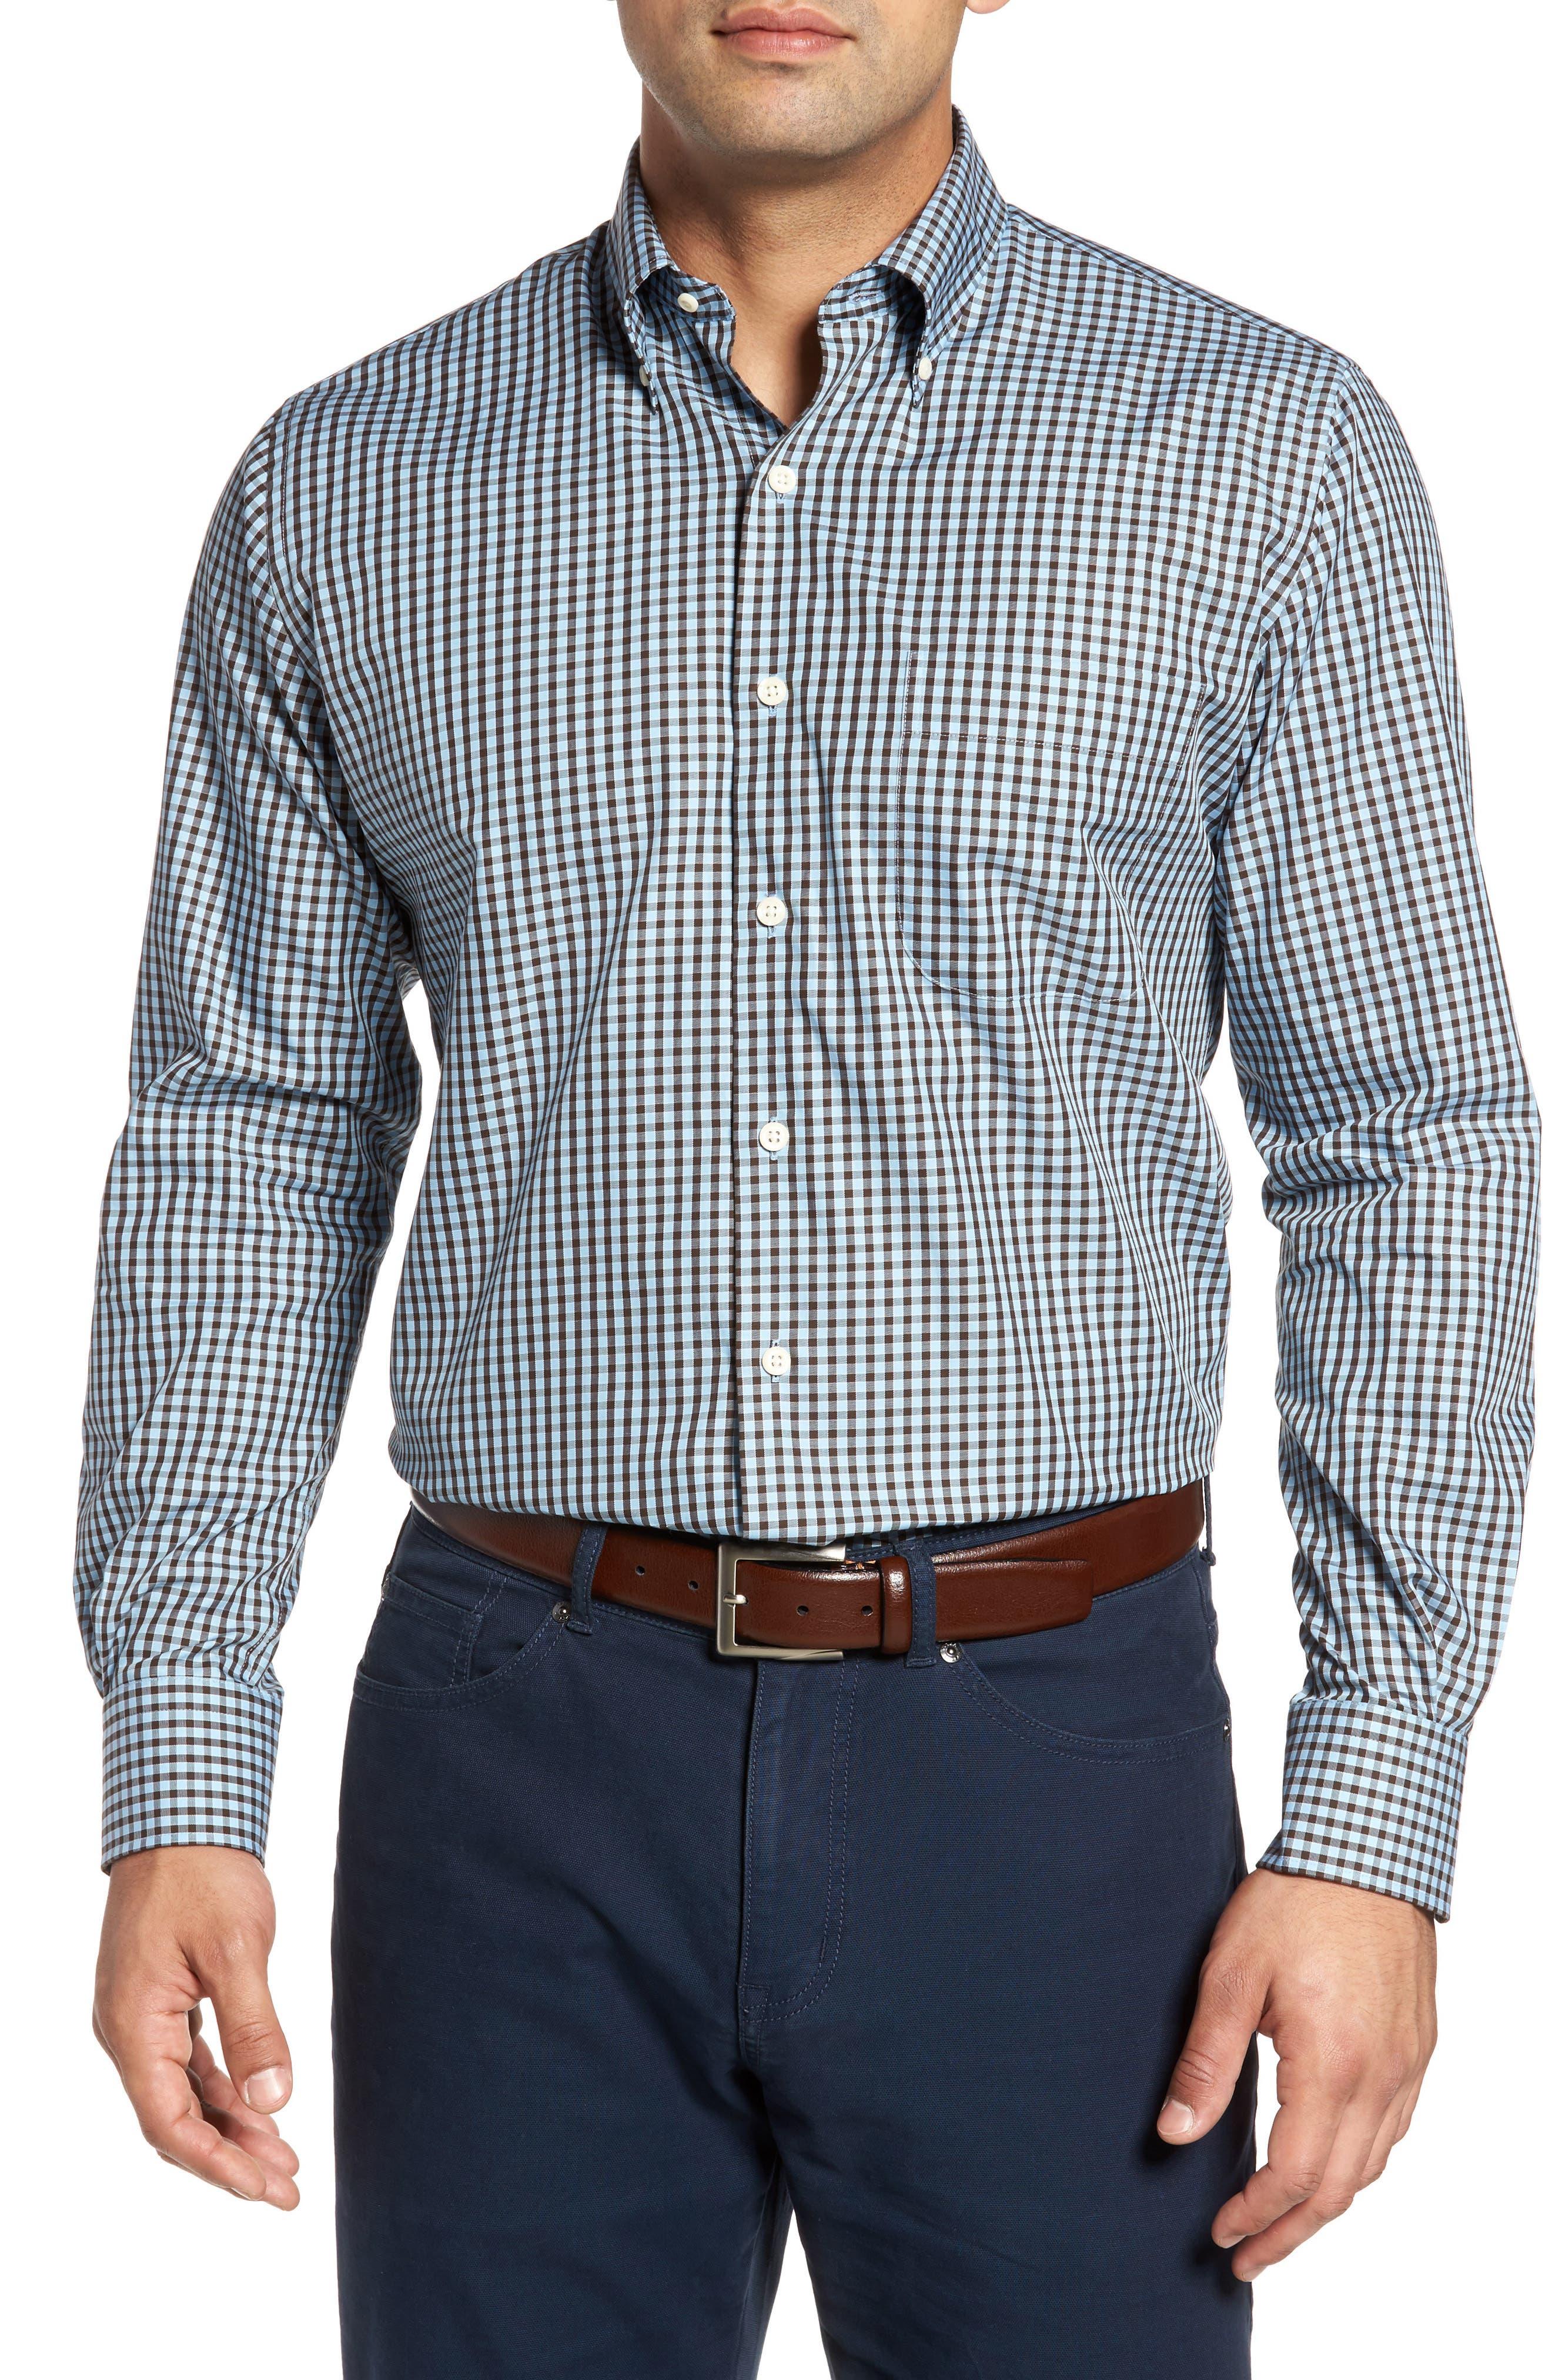 Alternate Image 1 Selected - Peter Millar Midwinter Gingham Regular Fit Sport Shirt